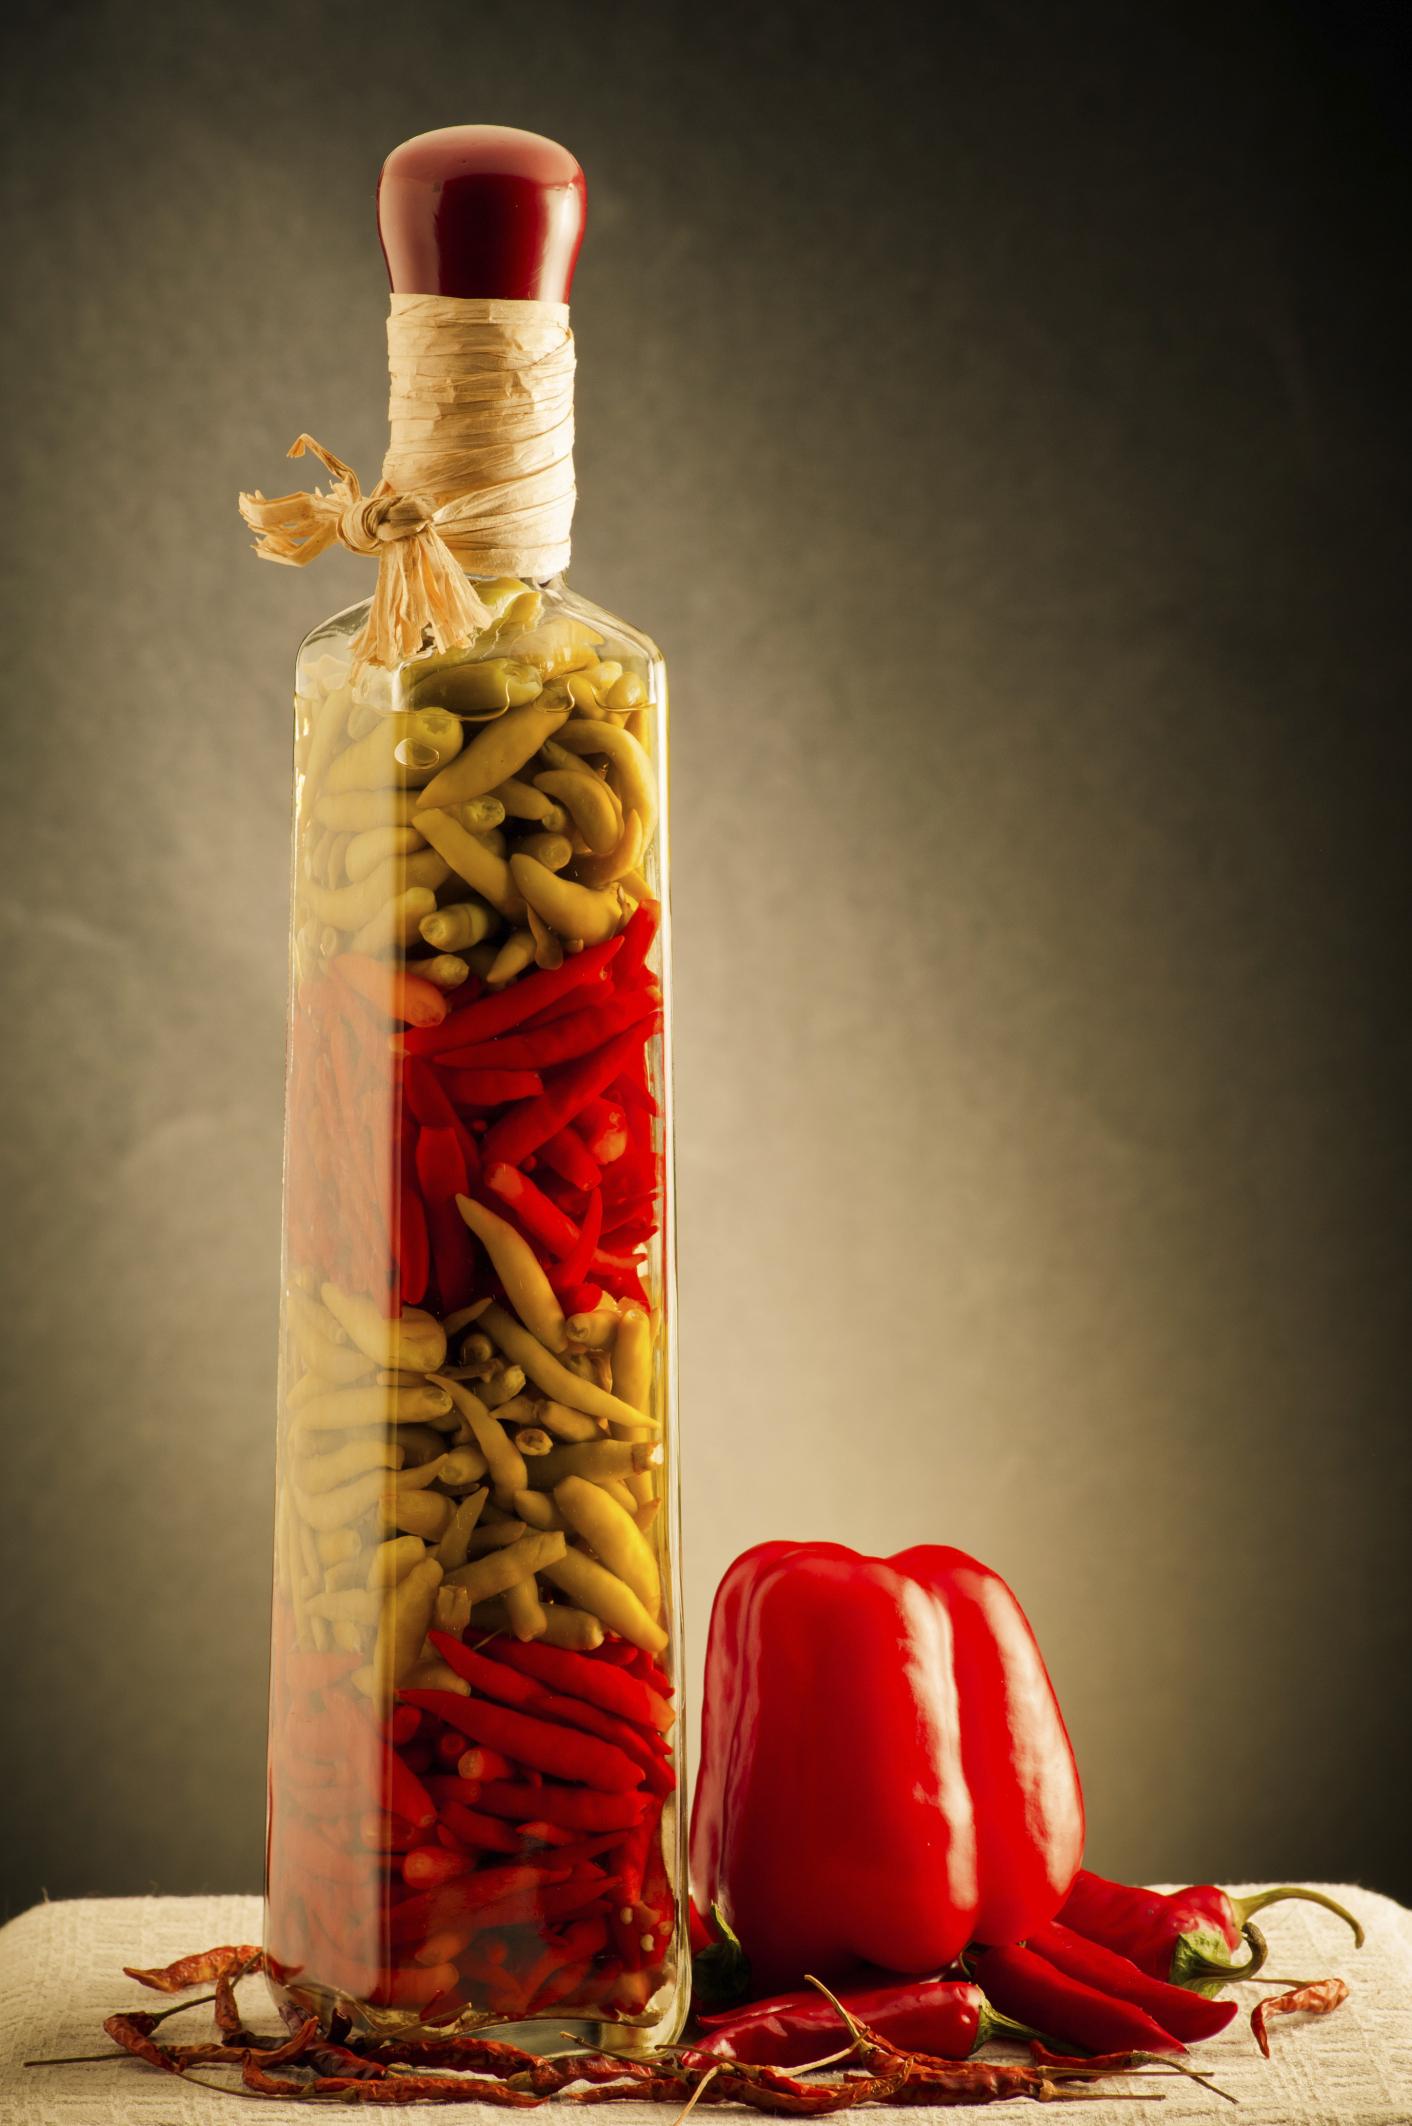 Conserva de chiles frescos